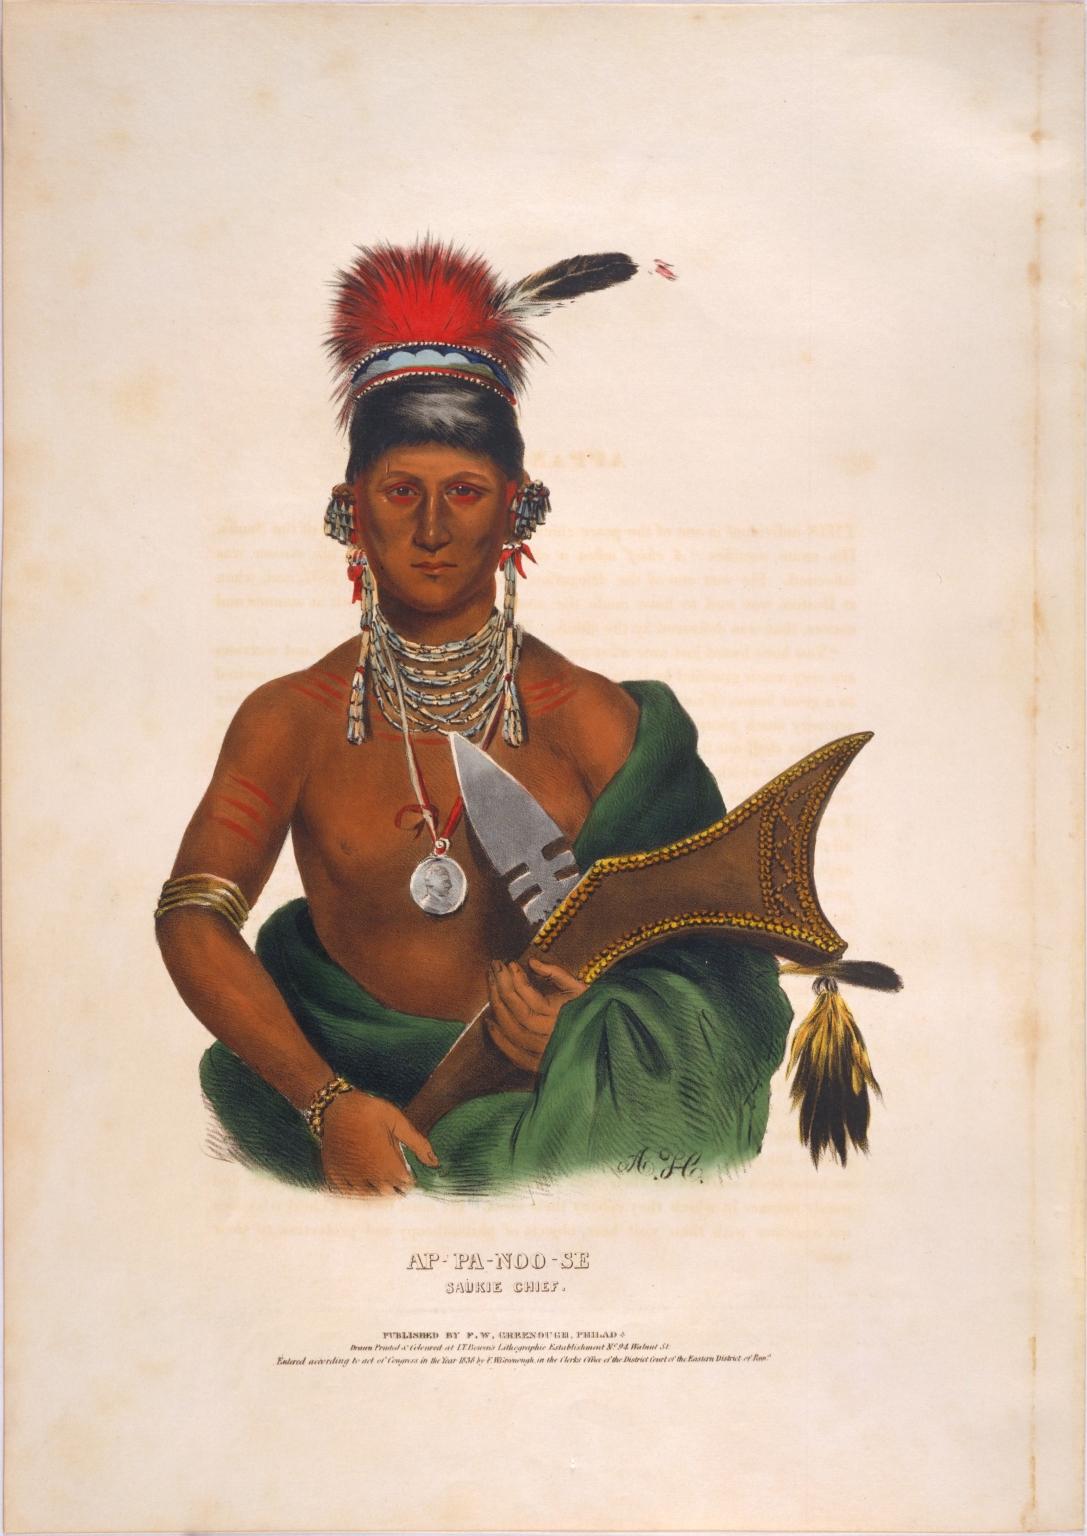 Ap-pa-noo-se, Saukie chief